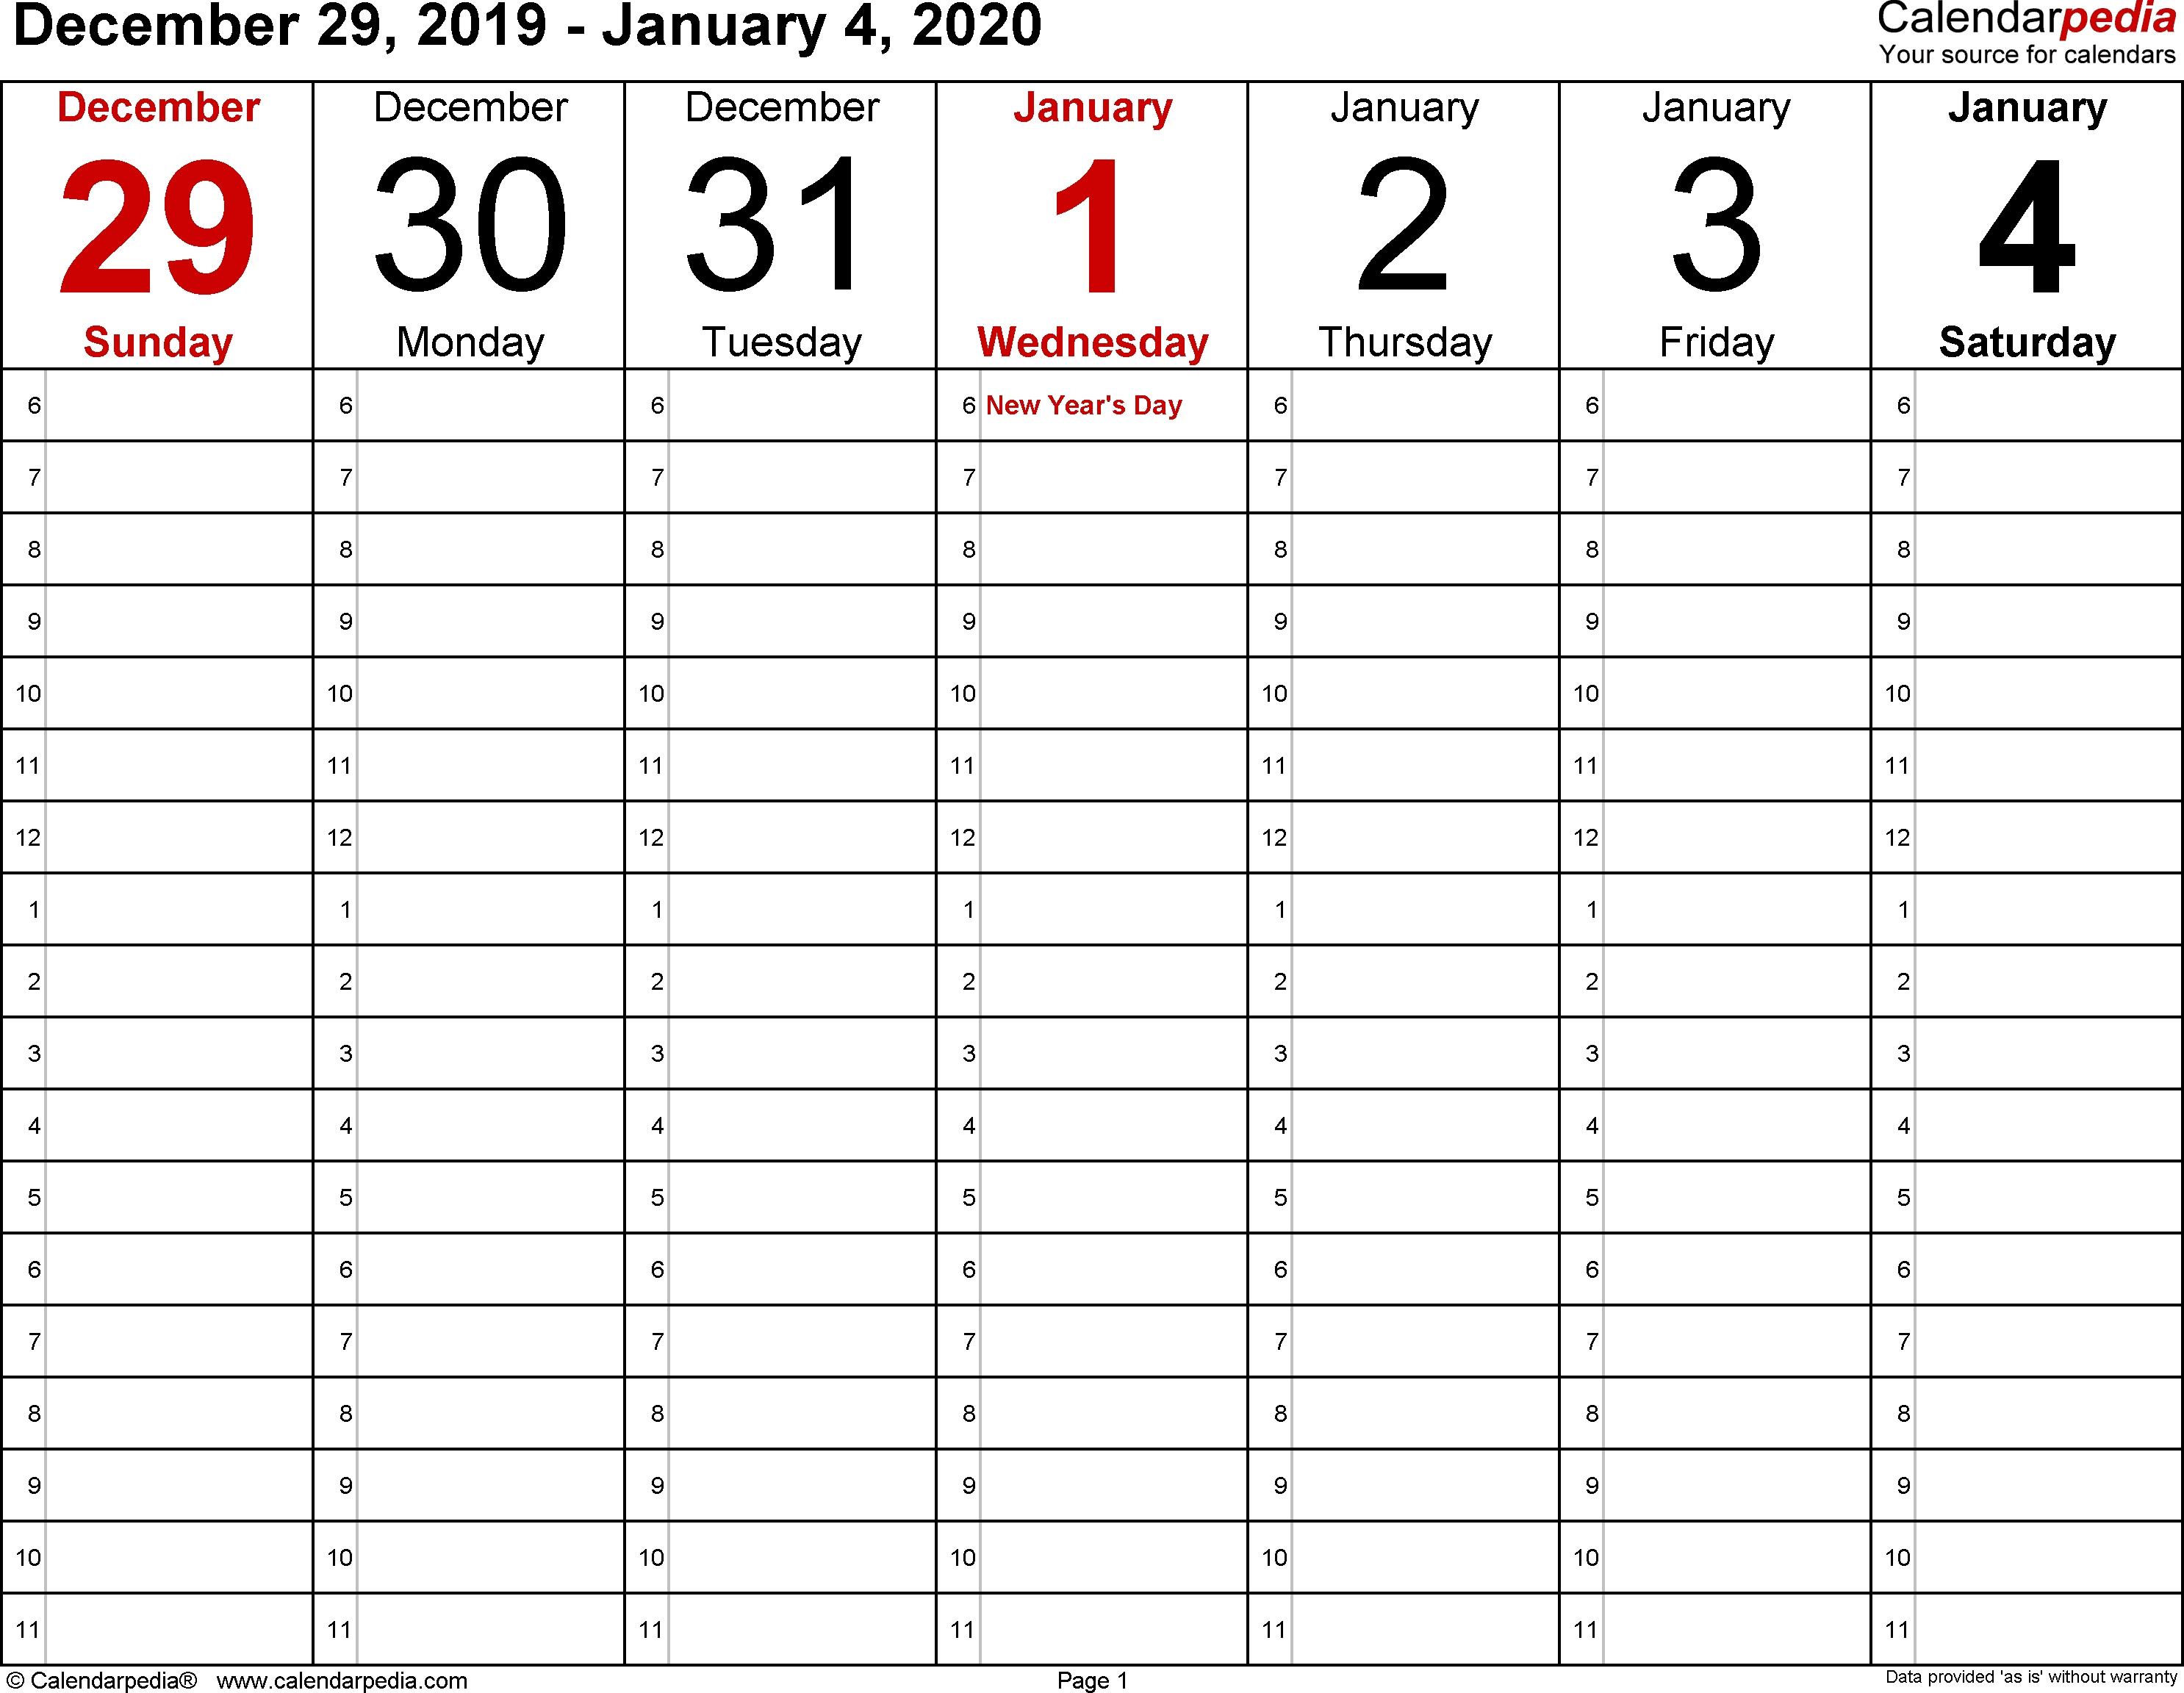 Weekly Calendar 2020 For Word - 12 Free Printable Templates with regard to Weekly Free Print Calendar 2019 2020